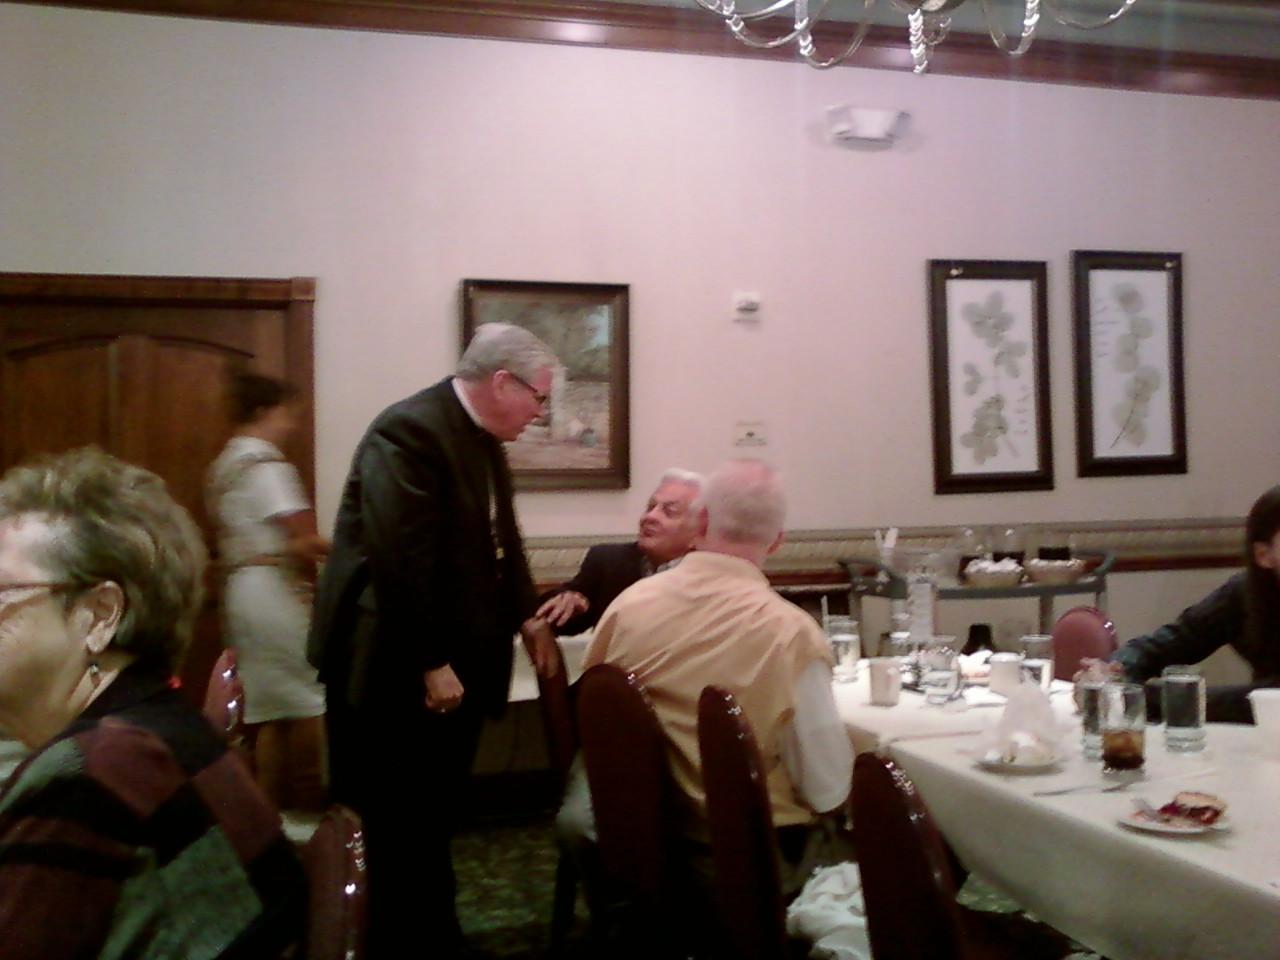 Dinner With The King  Catholic Champion Blog Bishop Frank J Dewane Has Dinner